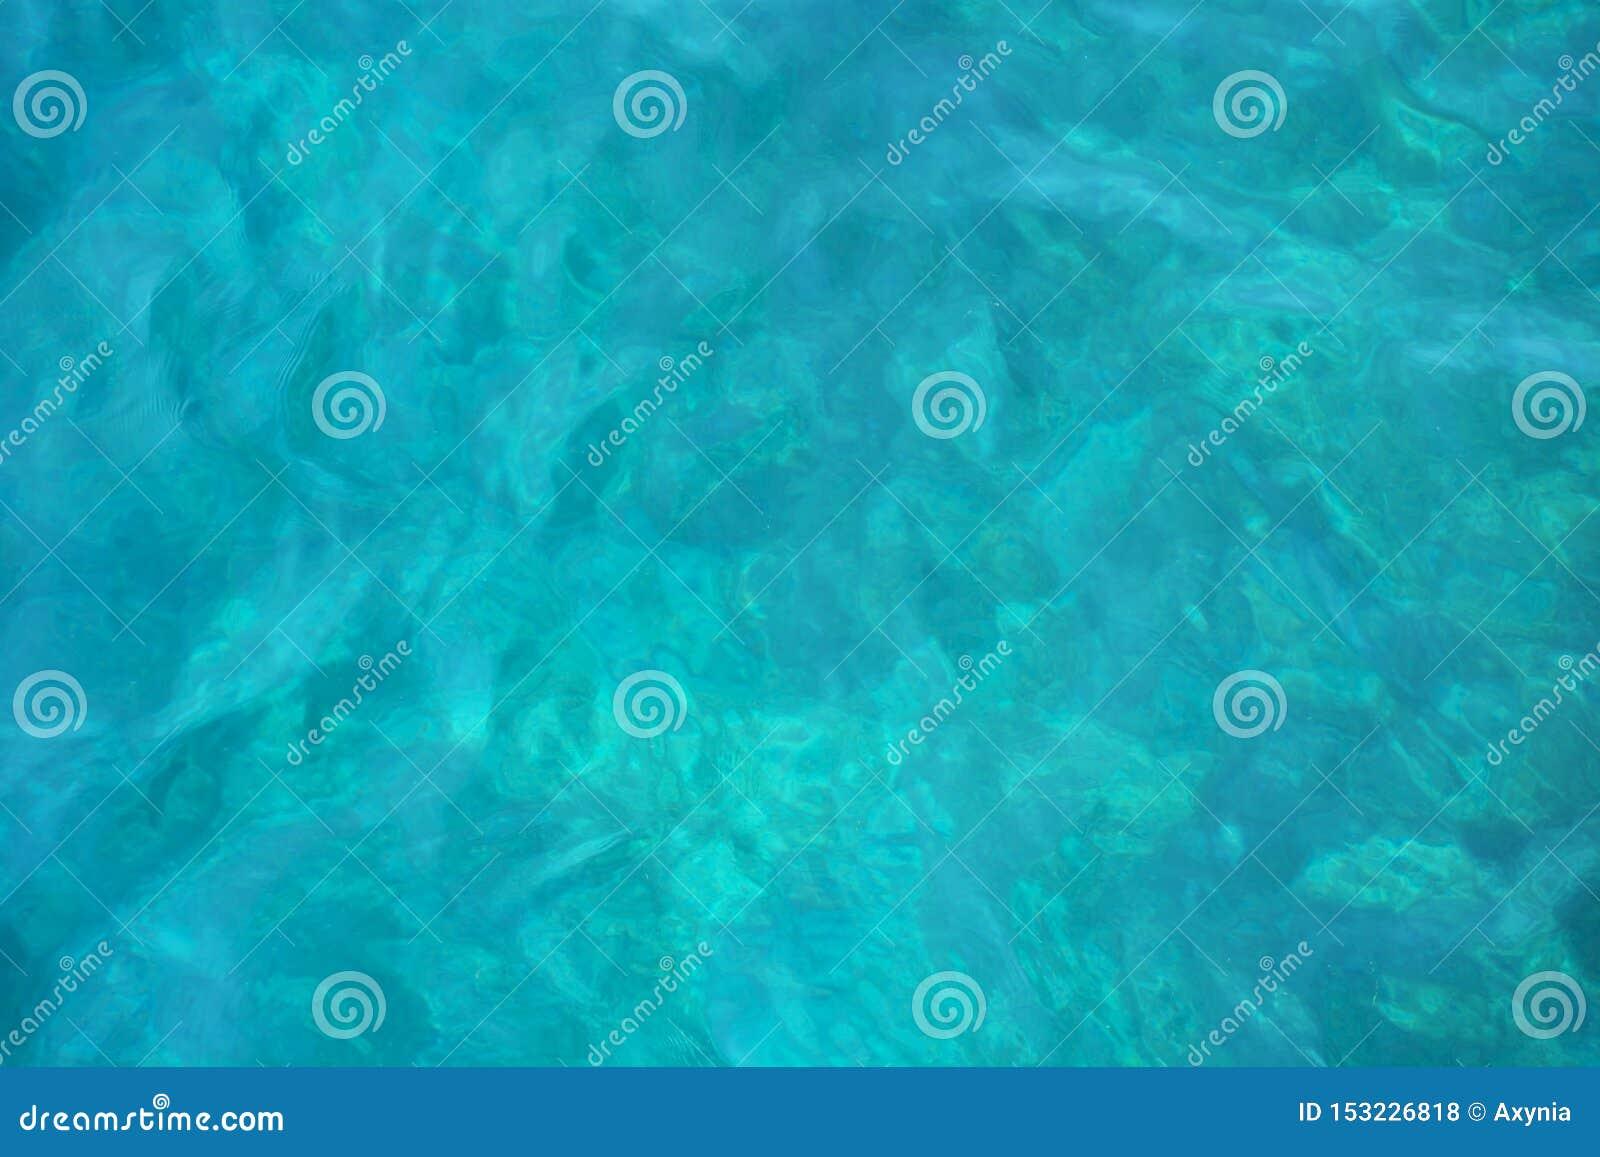 Blue sea water blurred ripple background. Aegean Sea, Turkey